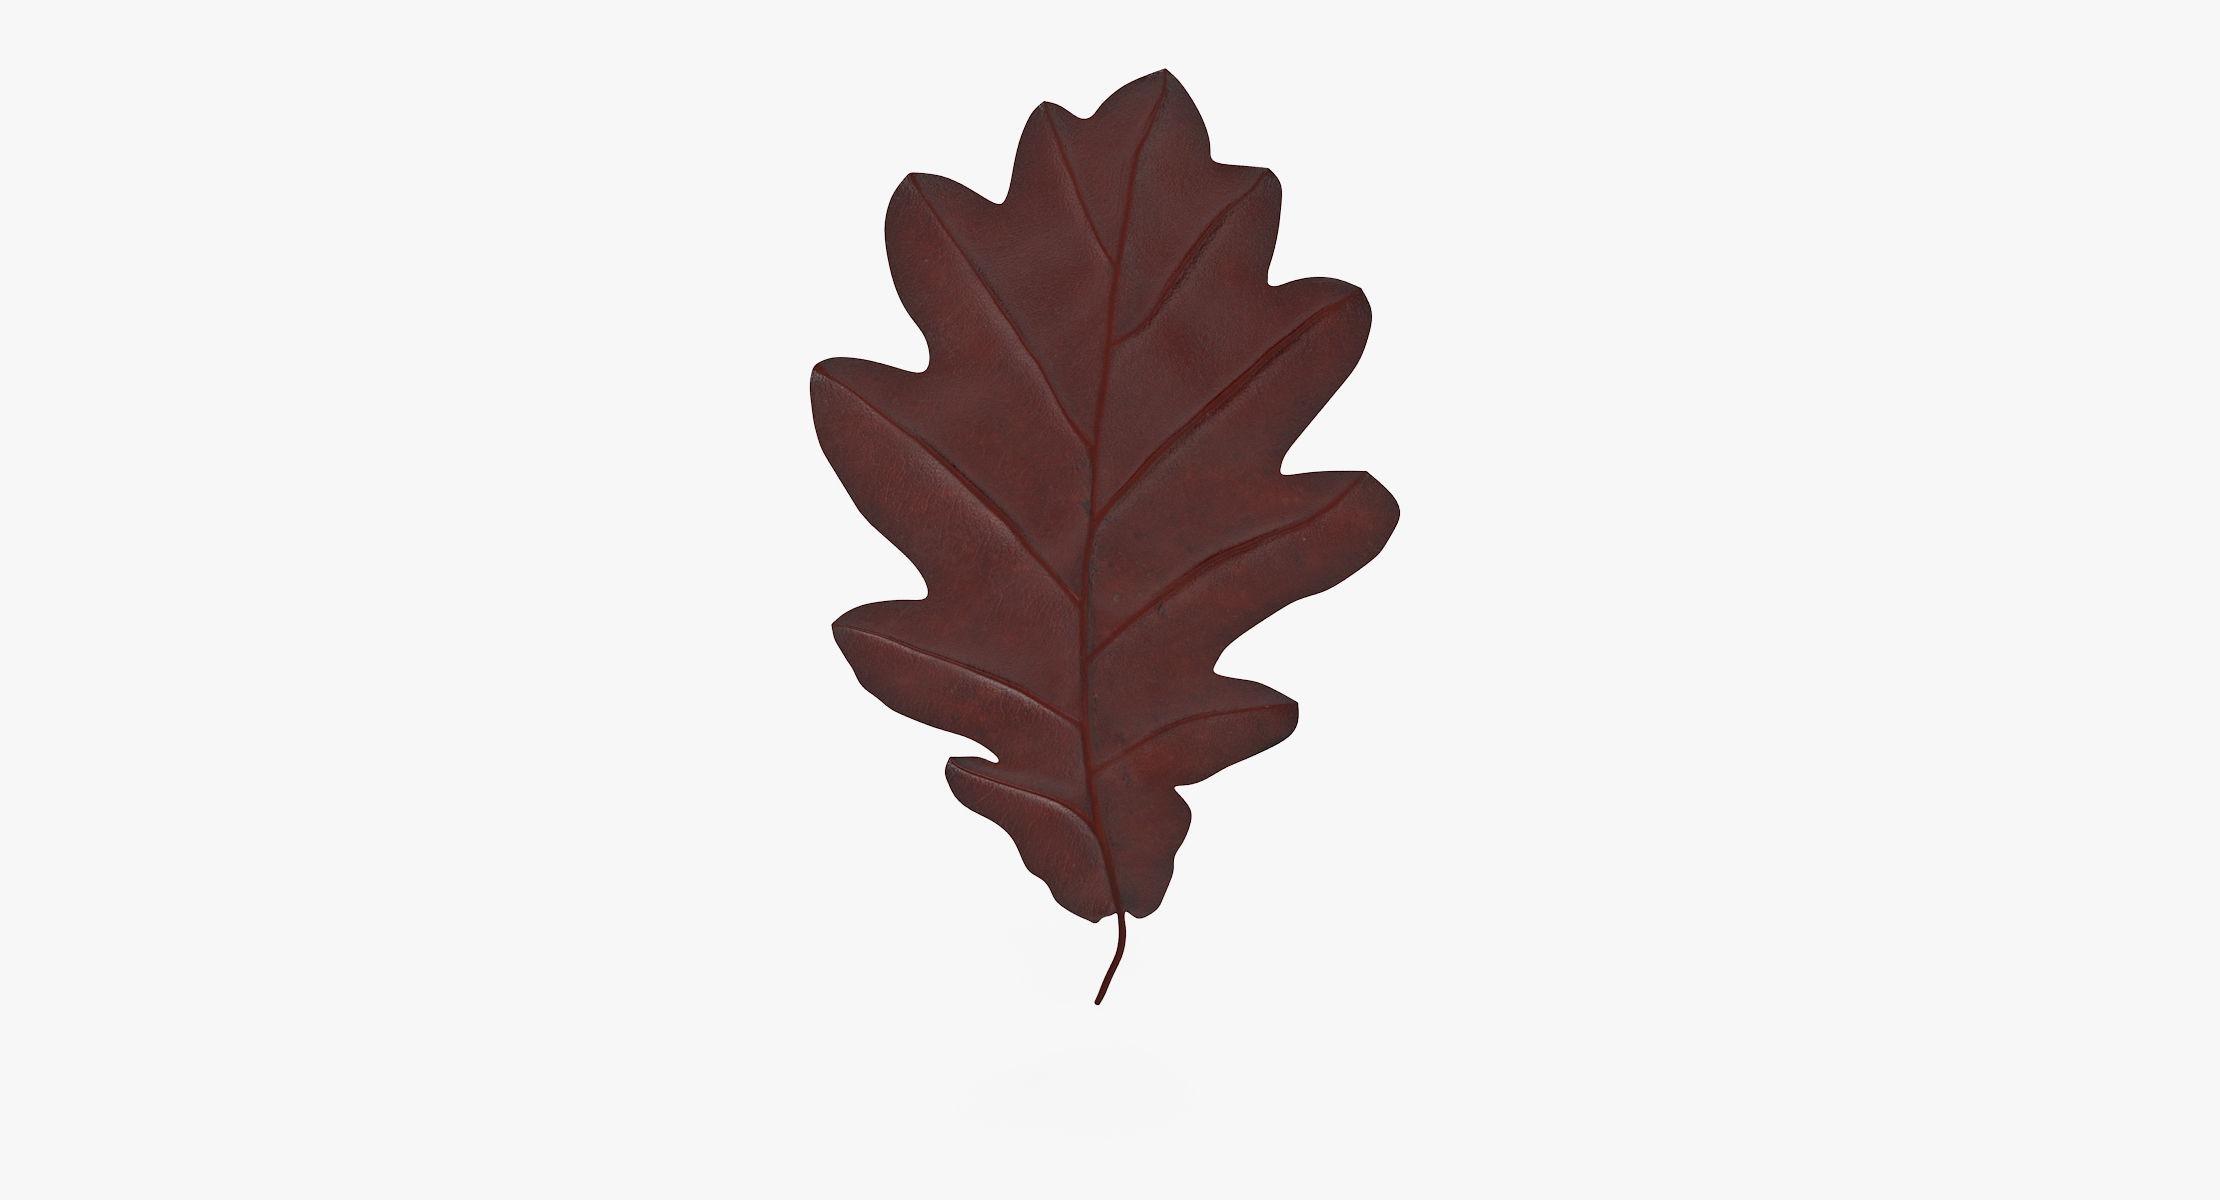 Oak Leaf Orange 01 - reel 1